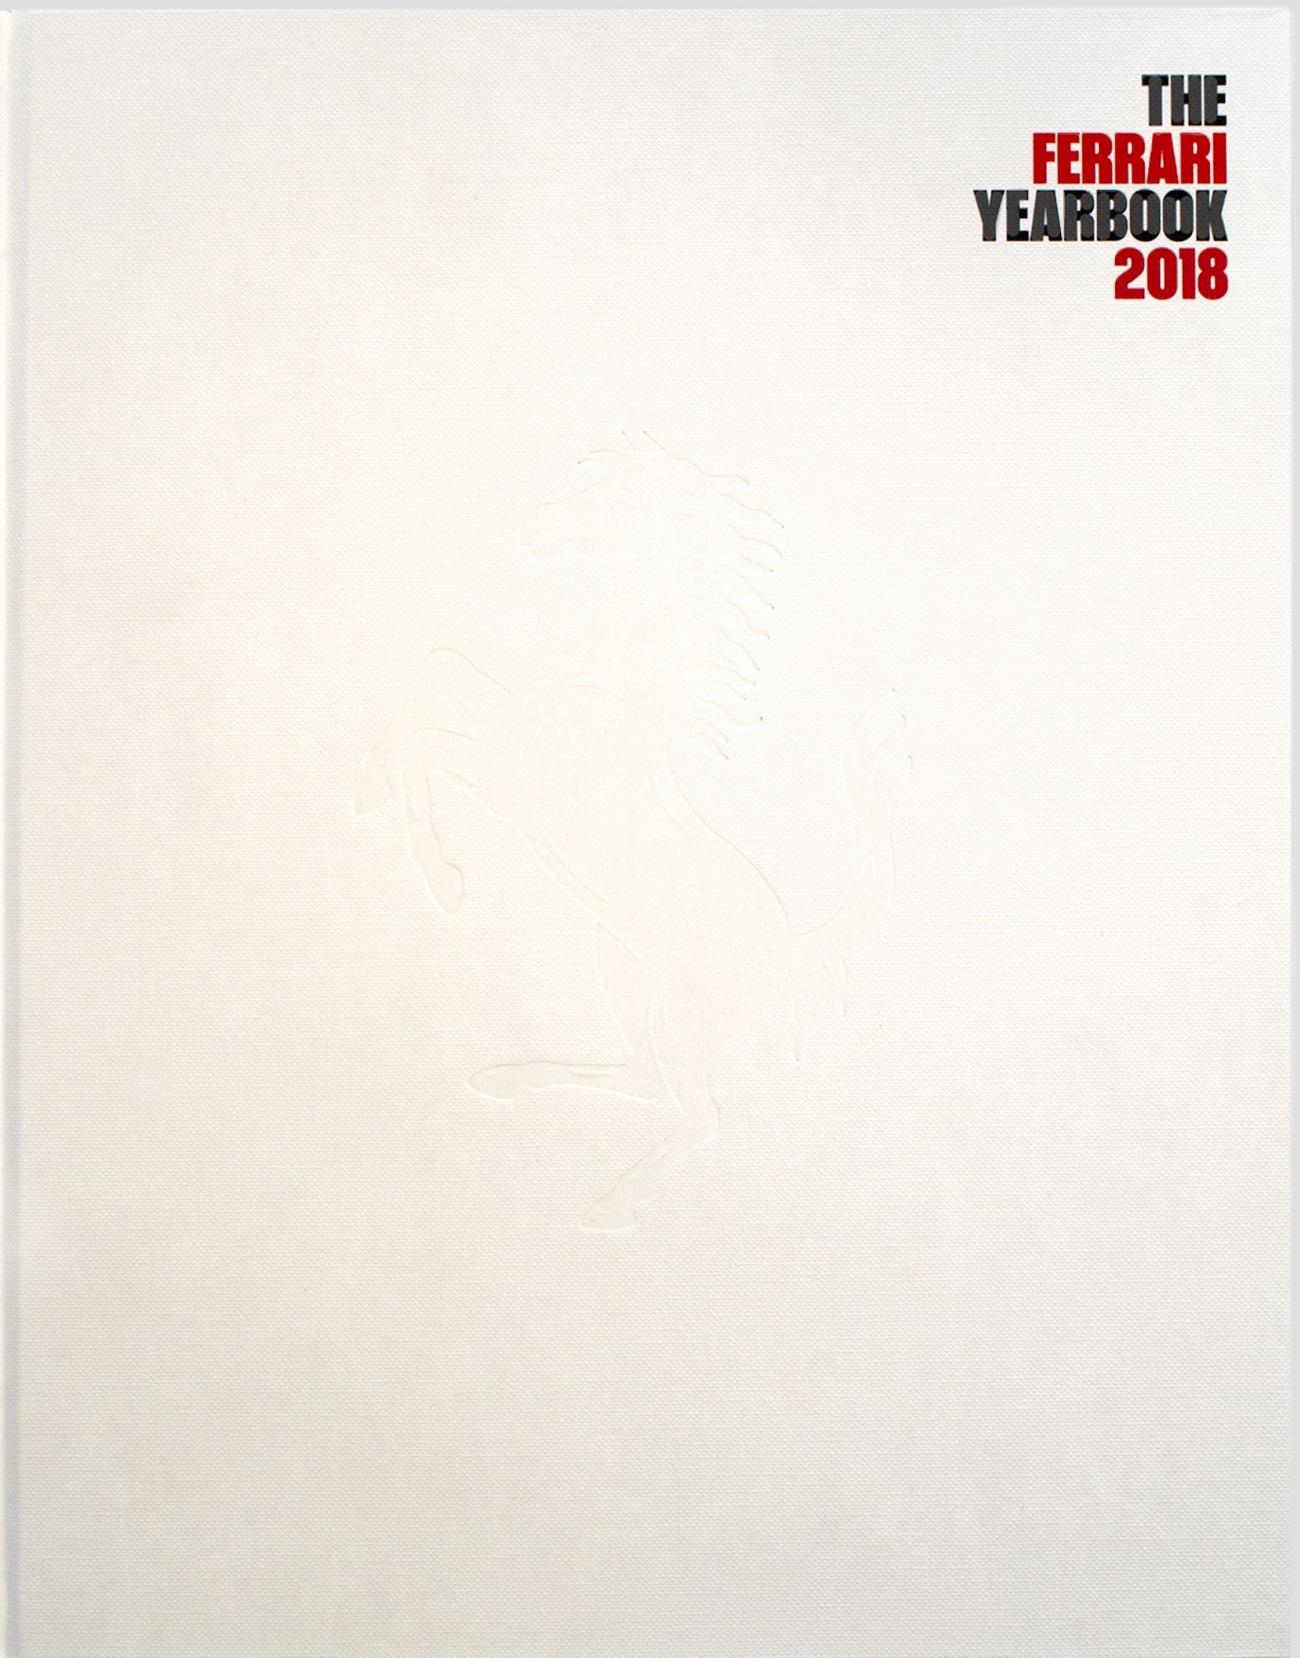 The Ferrari Yearbook 2018